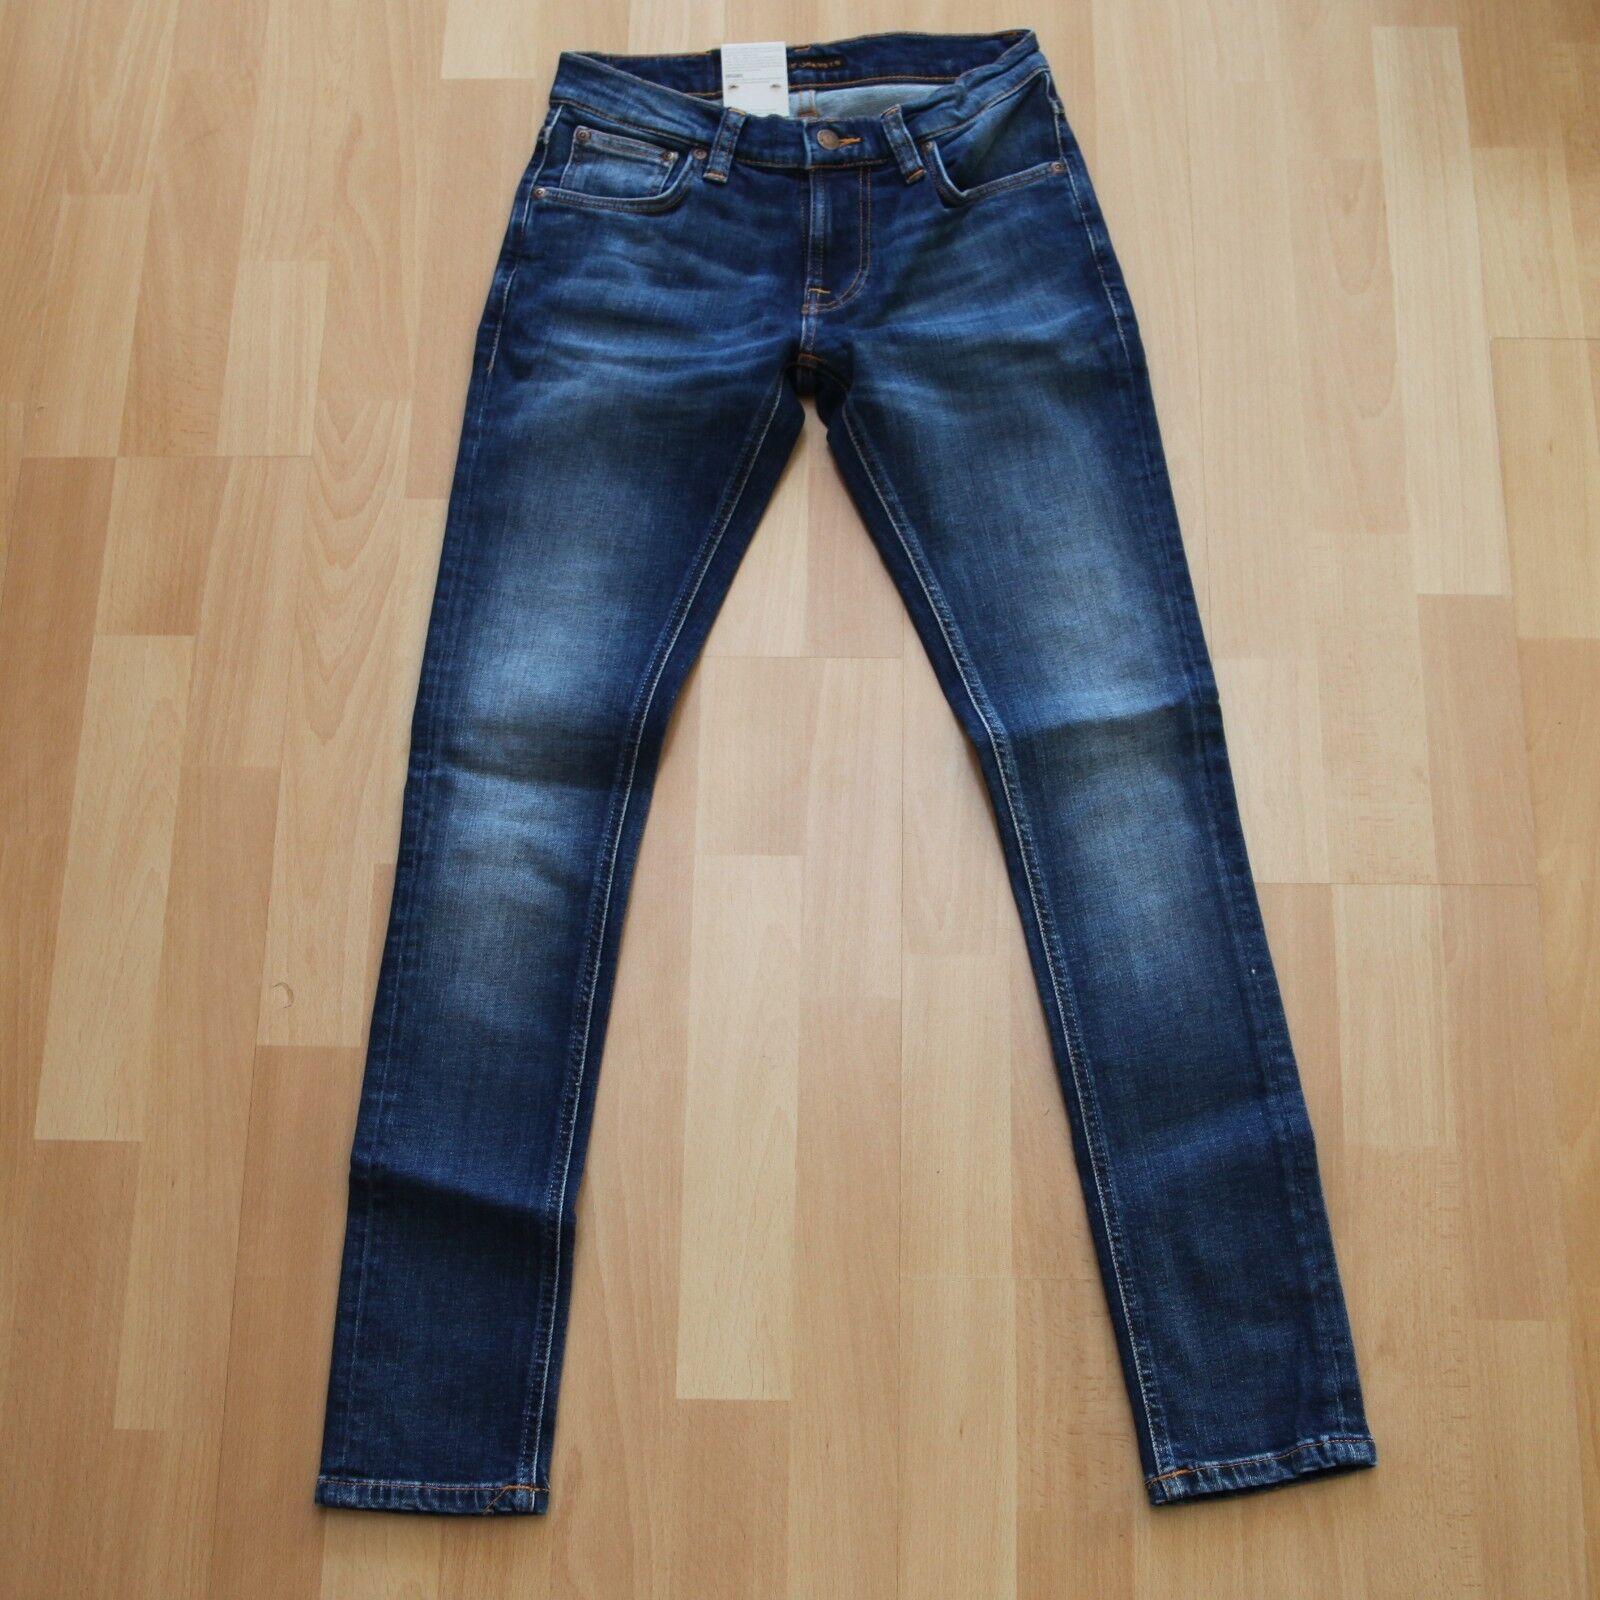 Nuevo Nudie Jeans tight Terry (tight antifit)  Organic sentimental azul 28 32  venta de ofertas